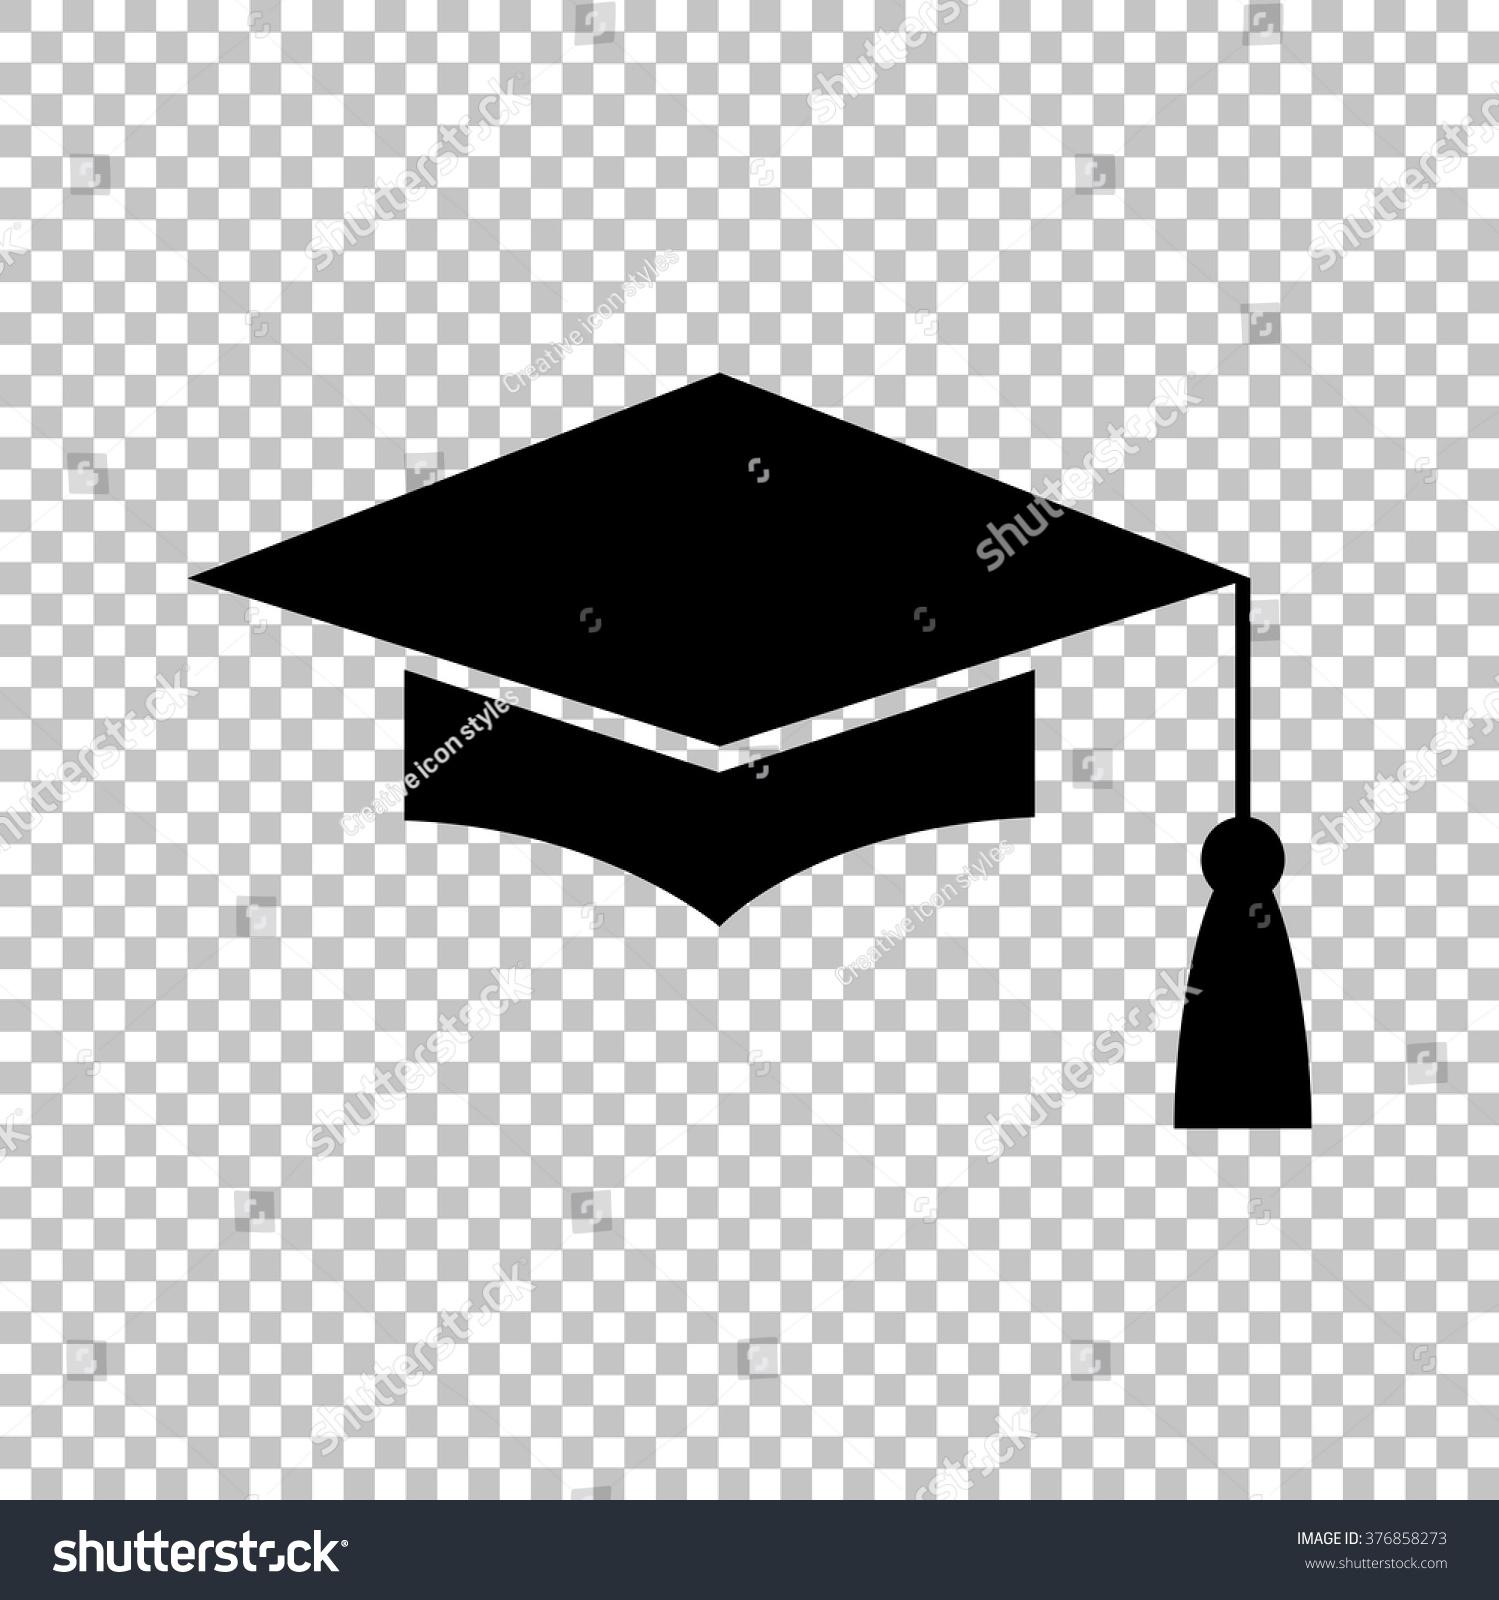 mortar board graduation cap education symbol stock vector